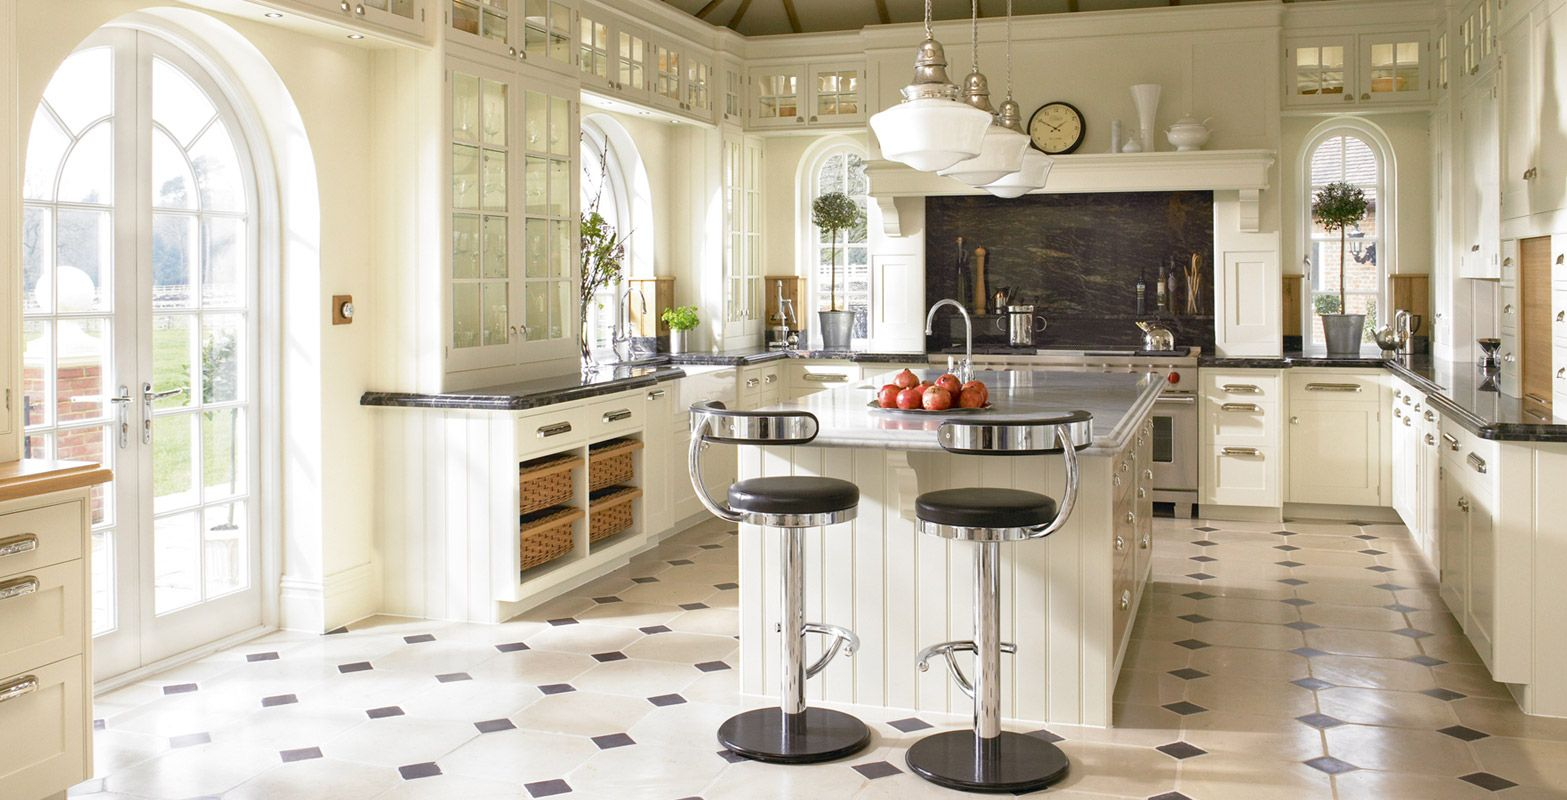 Картинки по запросу mark wilkinson kitchens Кухня и Картинки